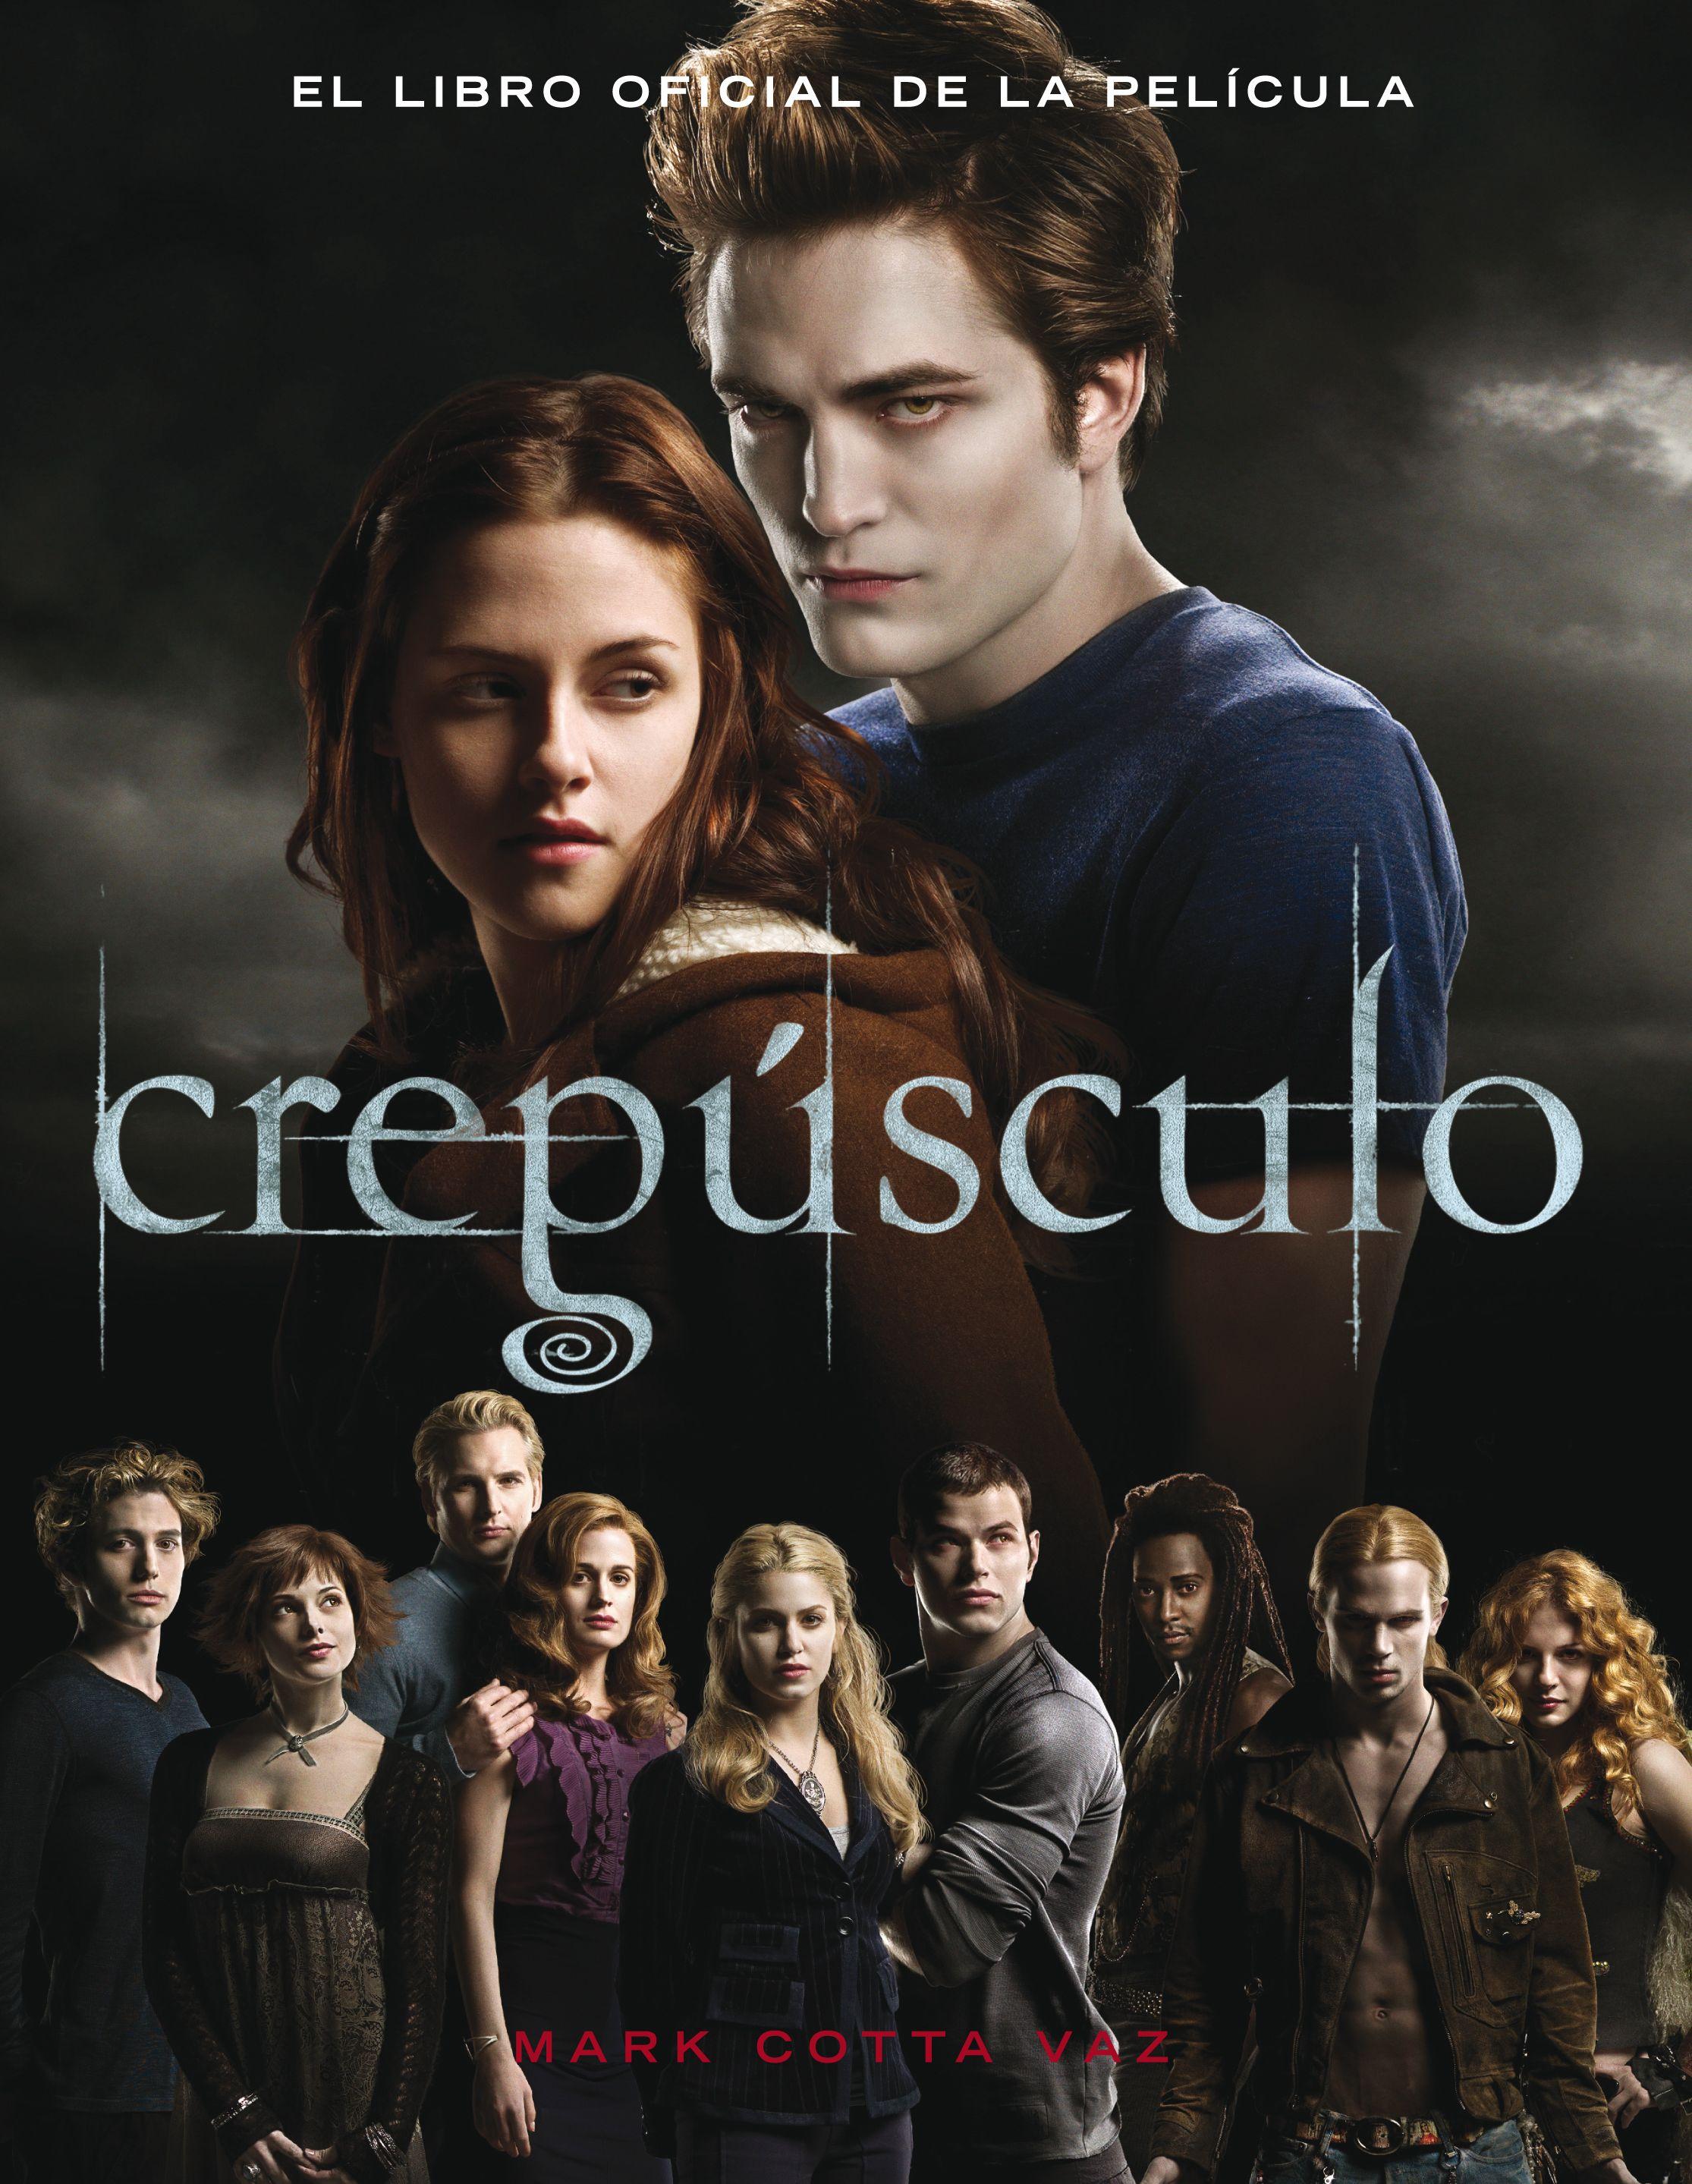 Crepusculo Com Imagens Crepusculo Filme Dialogos